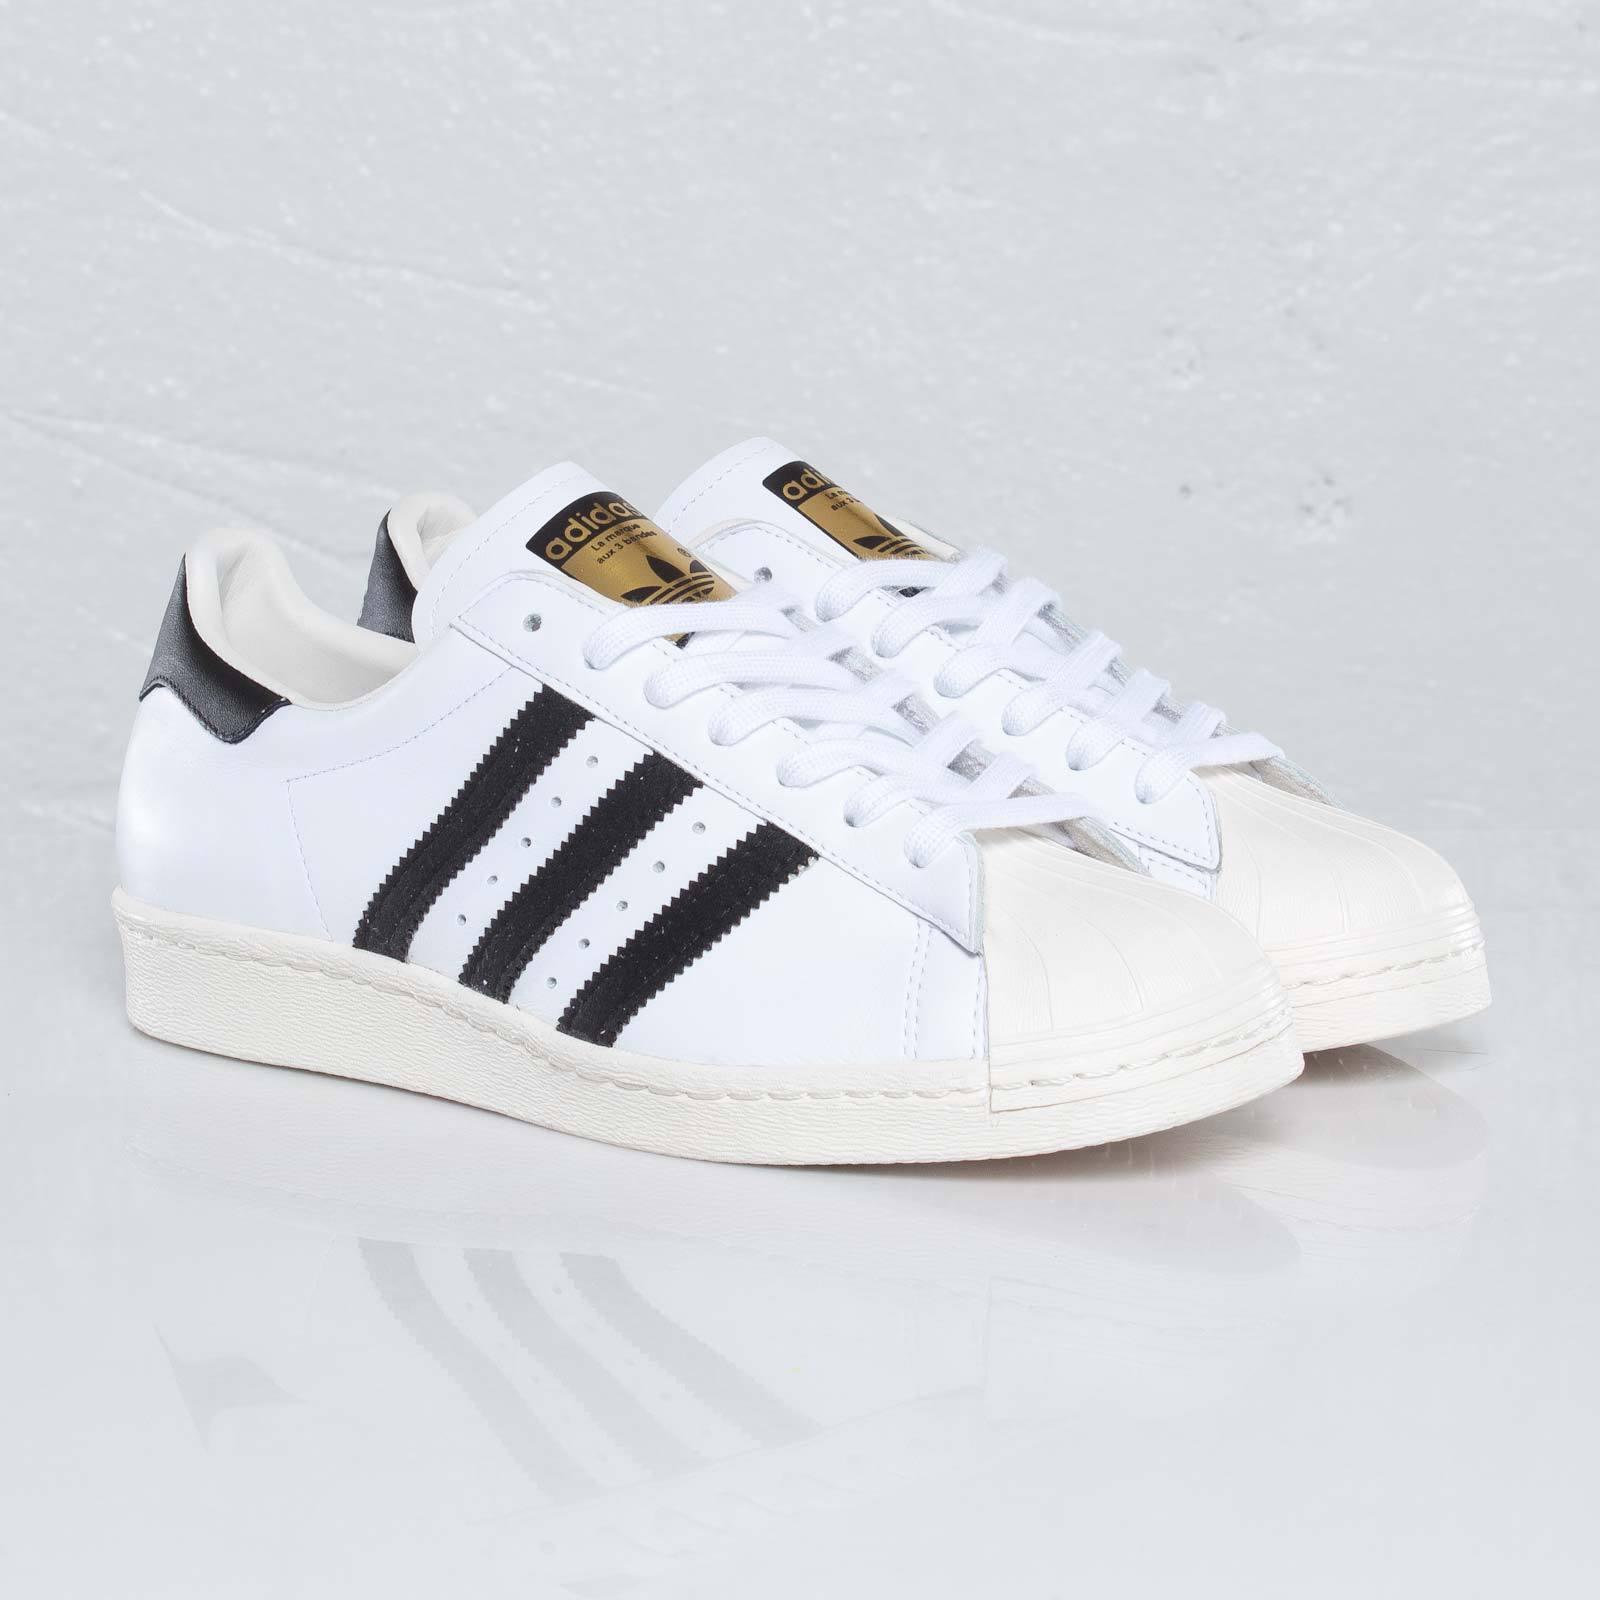 Adidas Superstar 80s G61070 White/Nero Uomo Sizes NEW   Authentic